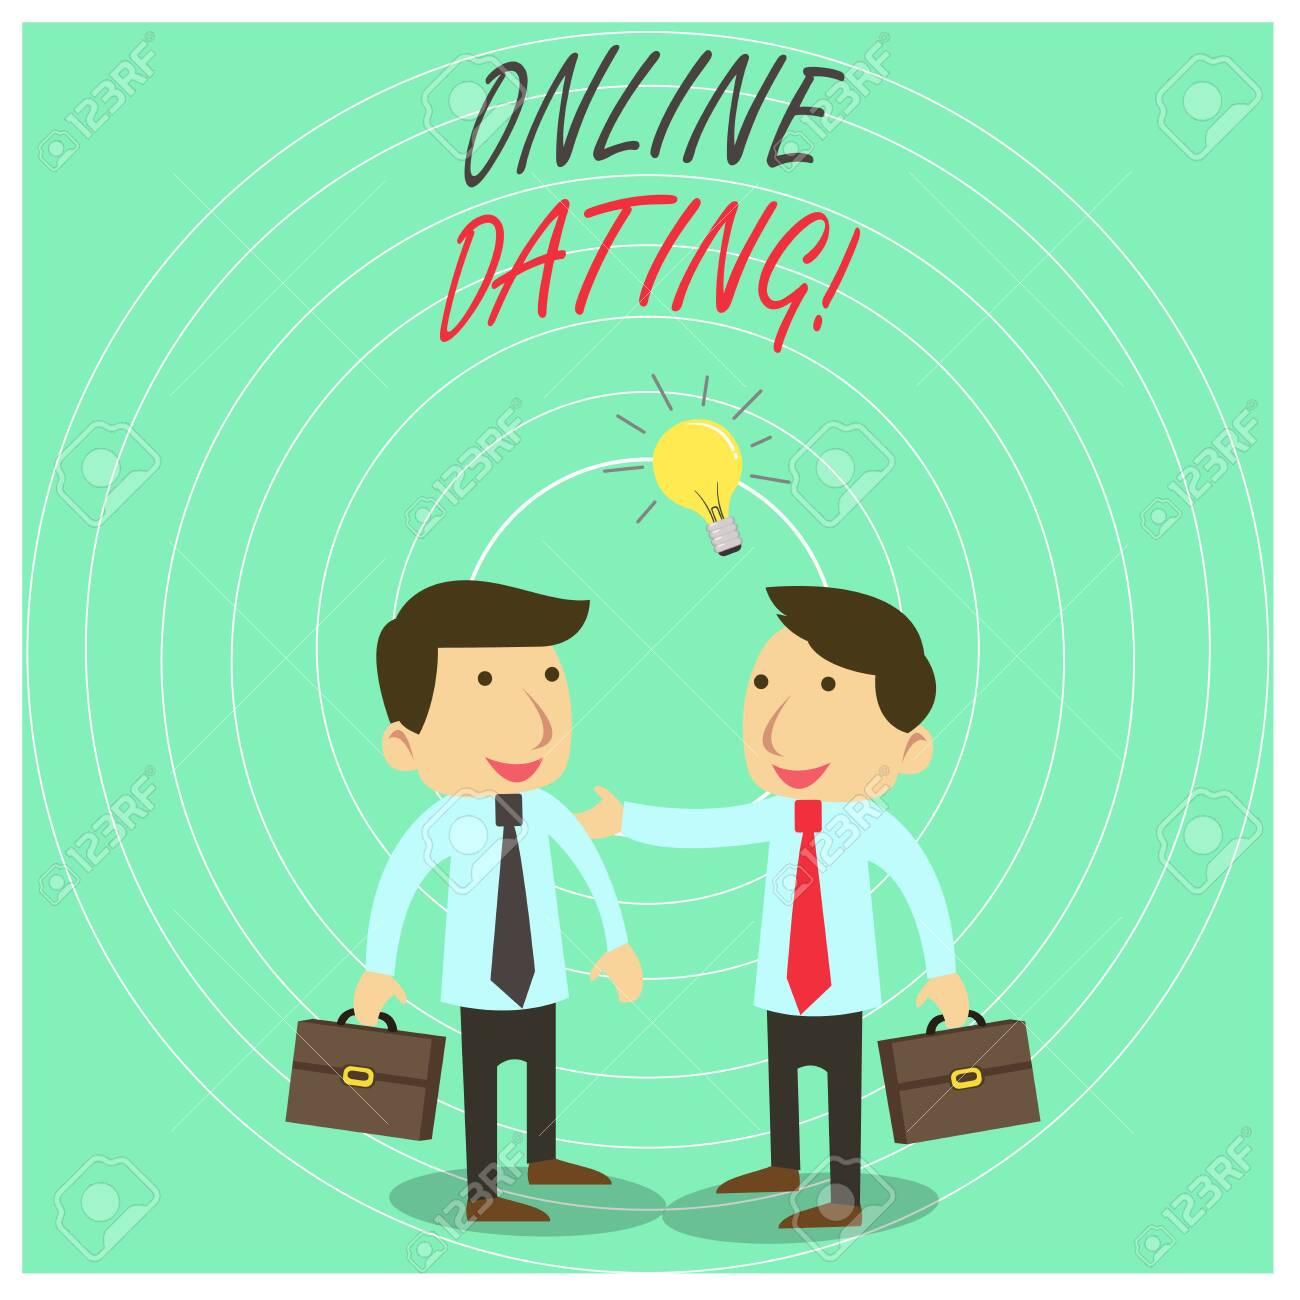 Dating online buona idea Rashida Jones incontri Drake